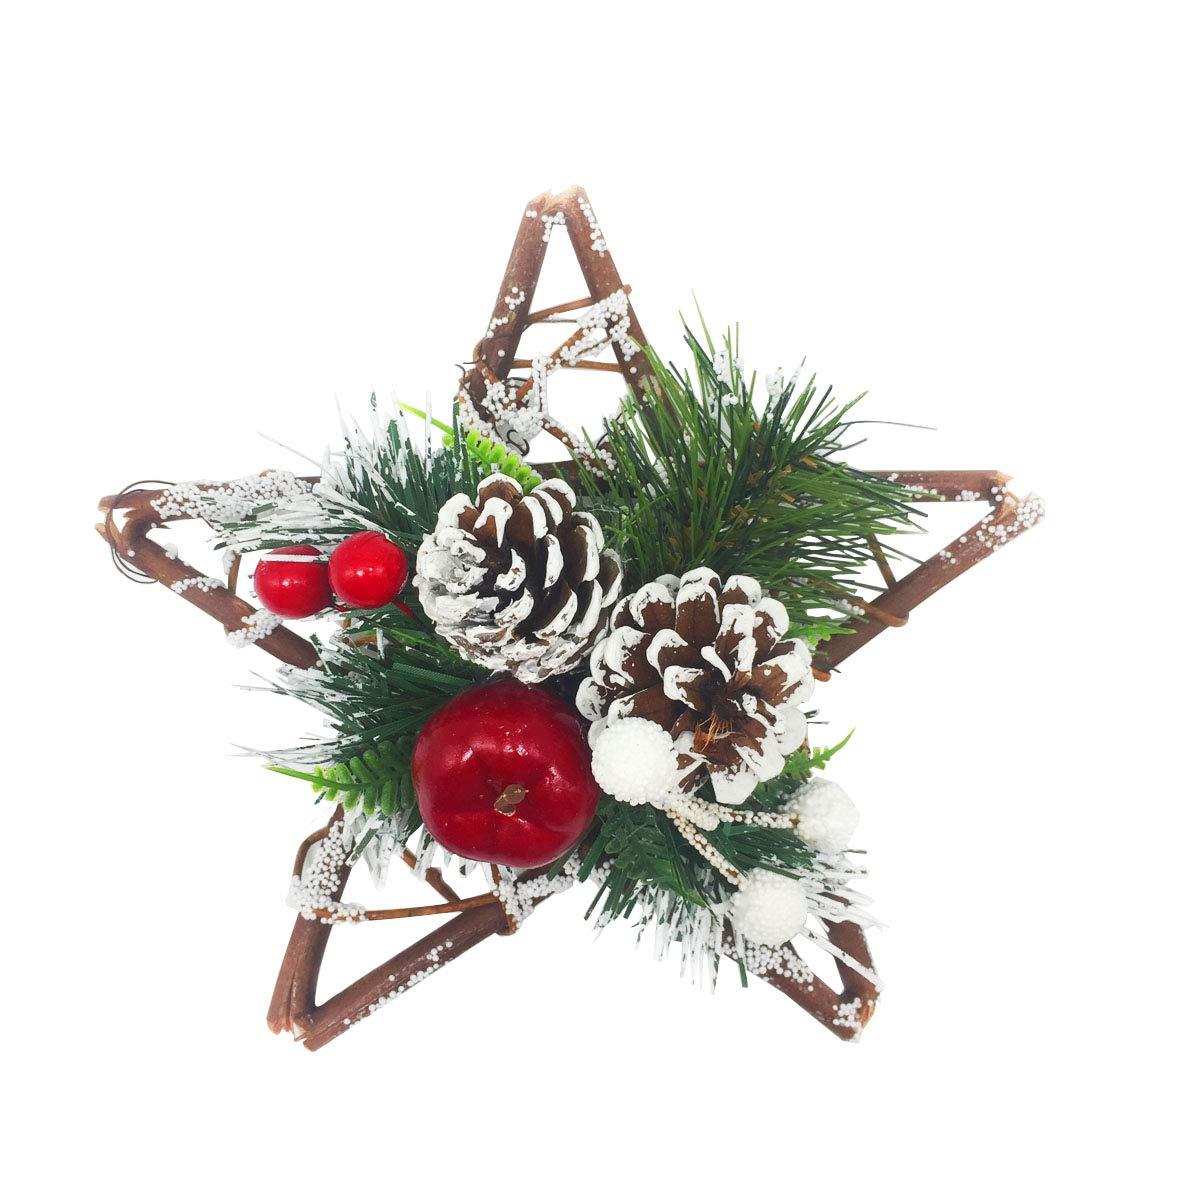 HOMETOOK Christmas Wreaths for Front Door - 8 inch Pentagram Yule Wreaths- Christmas Decorations - Seasonal Ornaments (8inch)